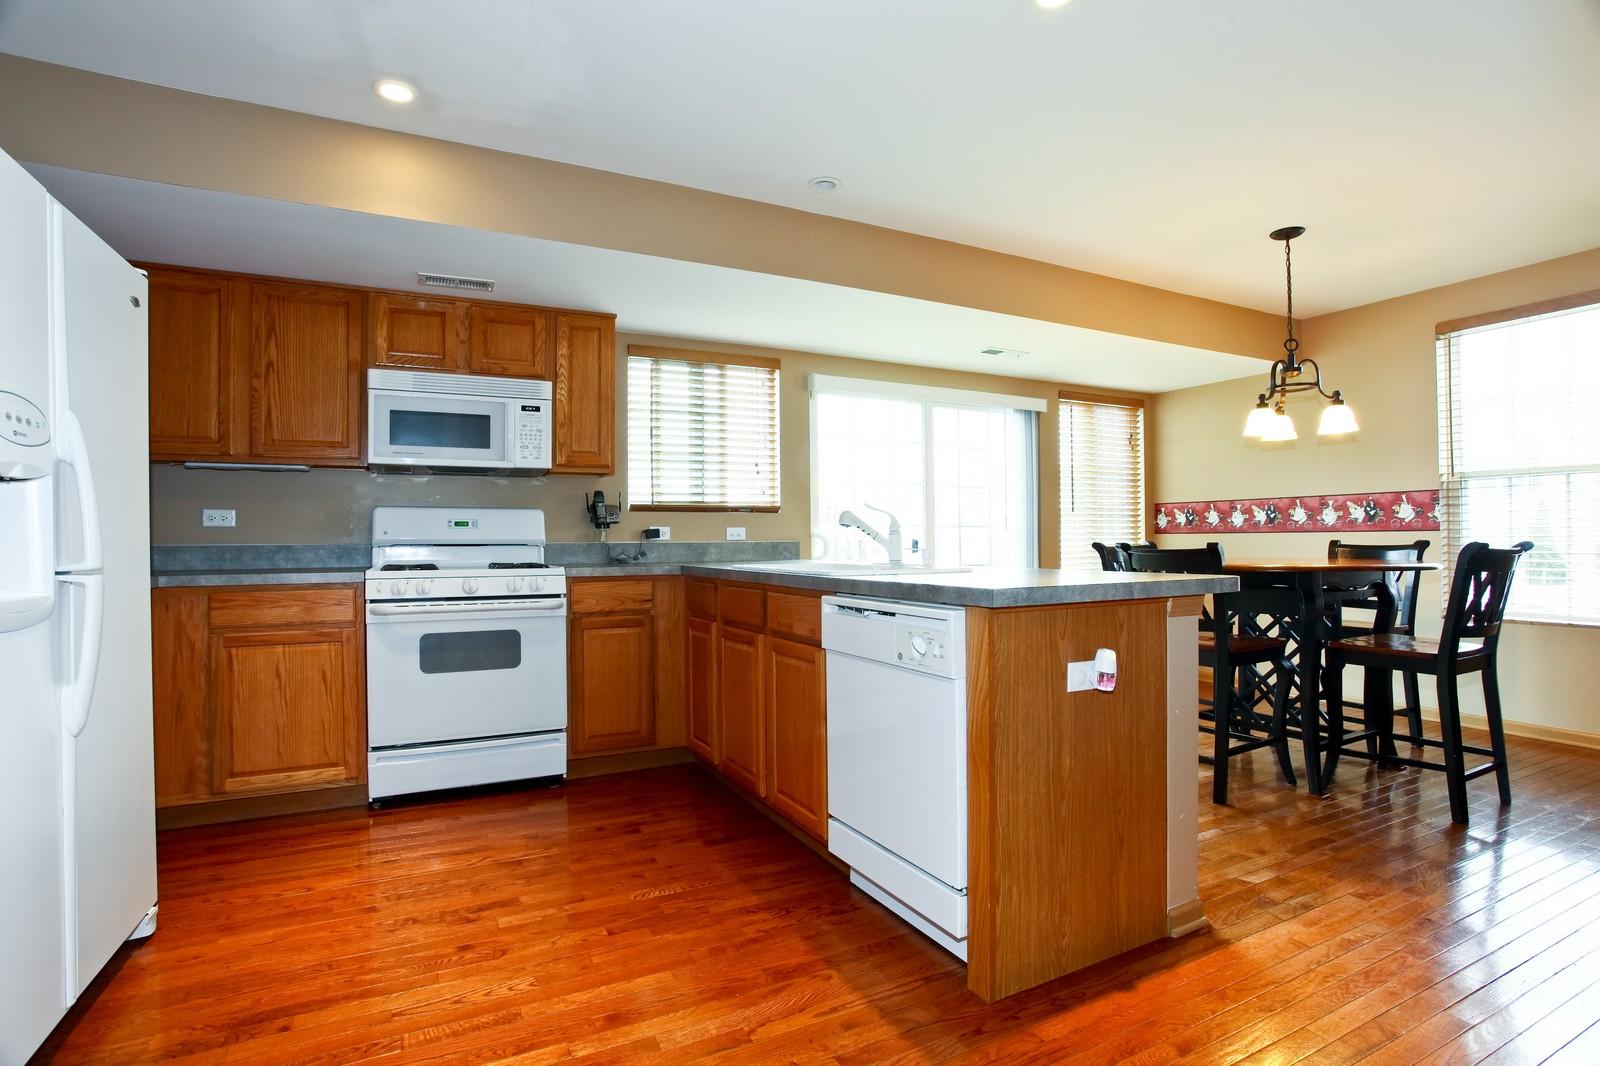 Real Estate Photography - 1745 Rebecca Lane, Aurora, IL, 60504 - Kitchen